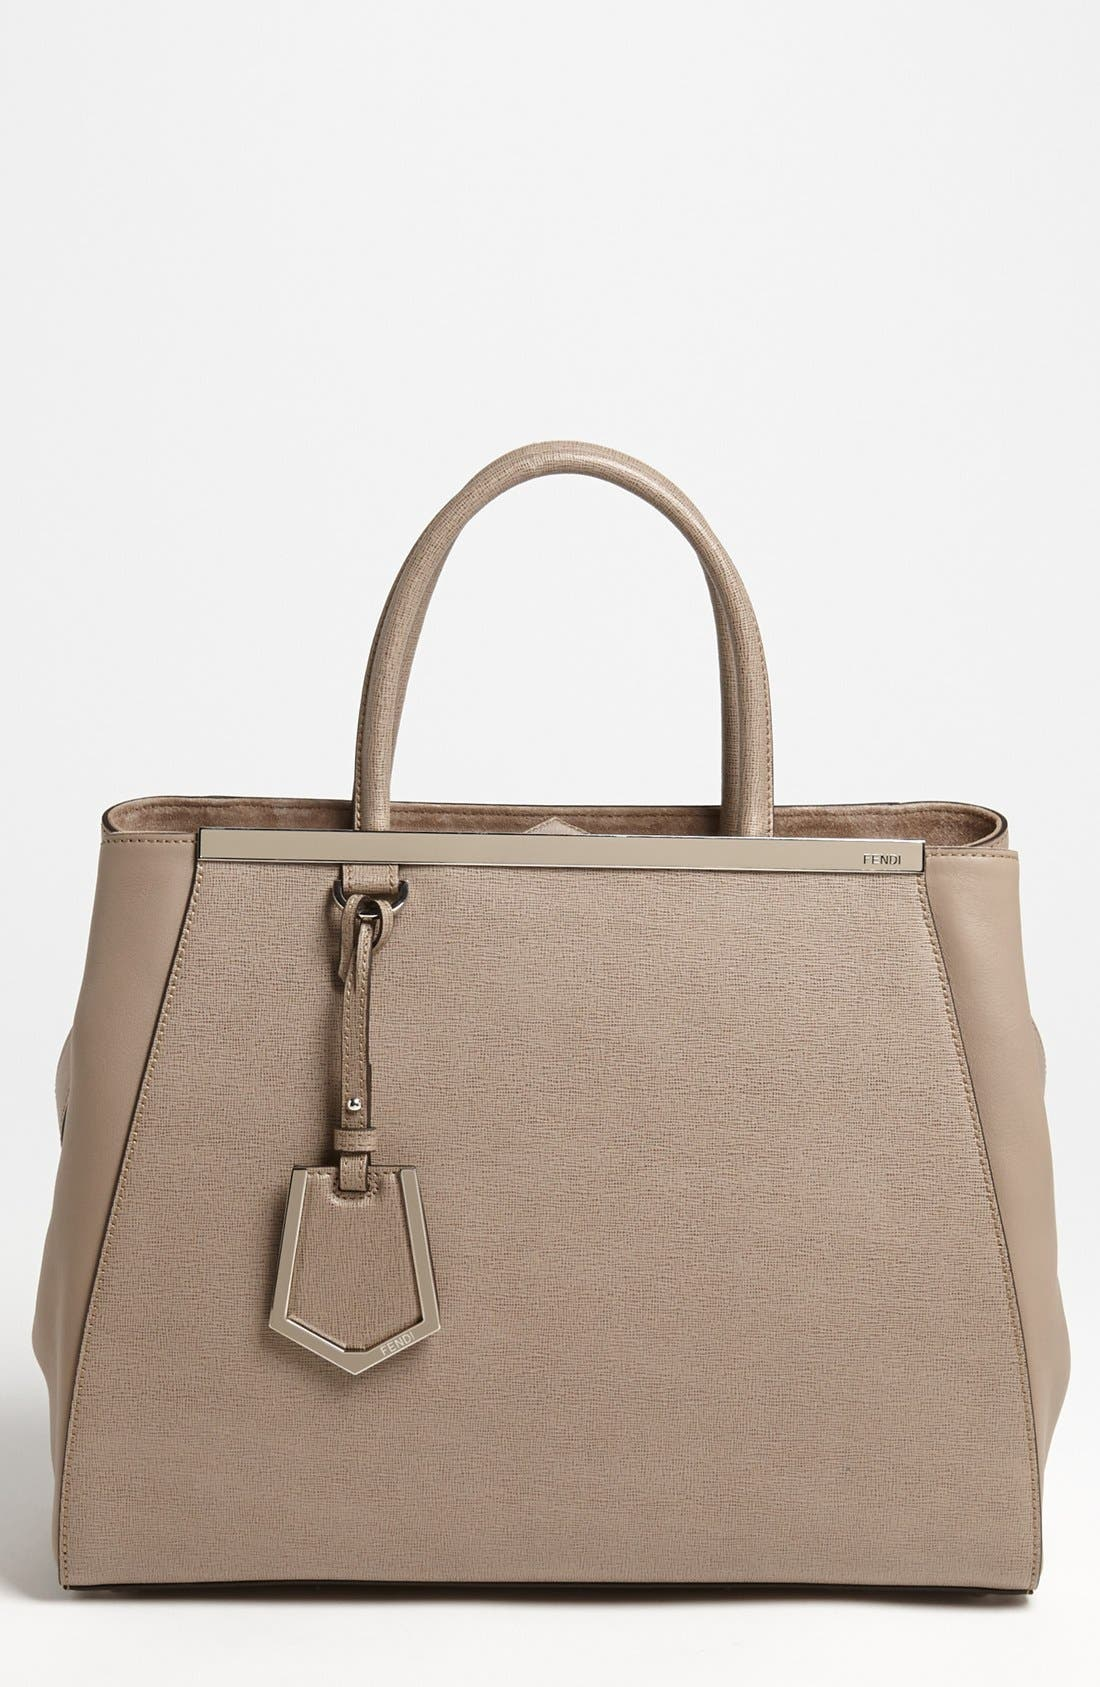 Main Image - Fendi '2Jours Elite' Leather Shopper